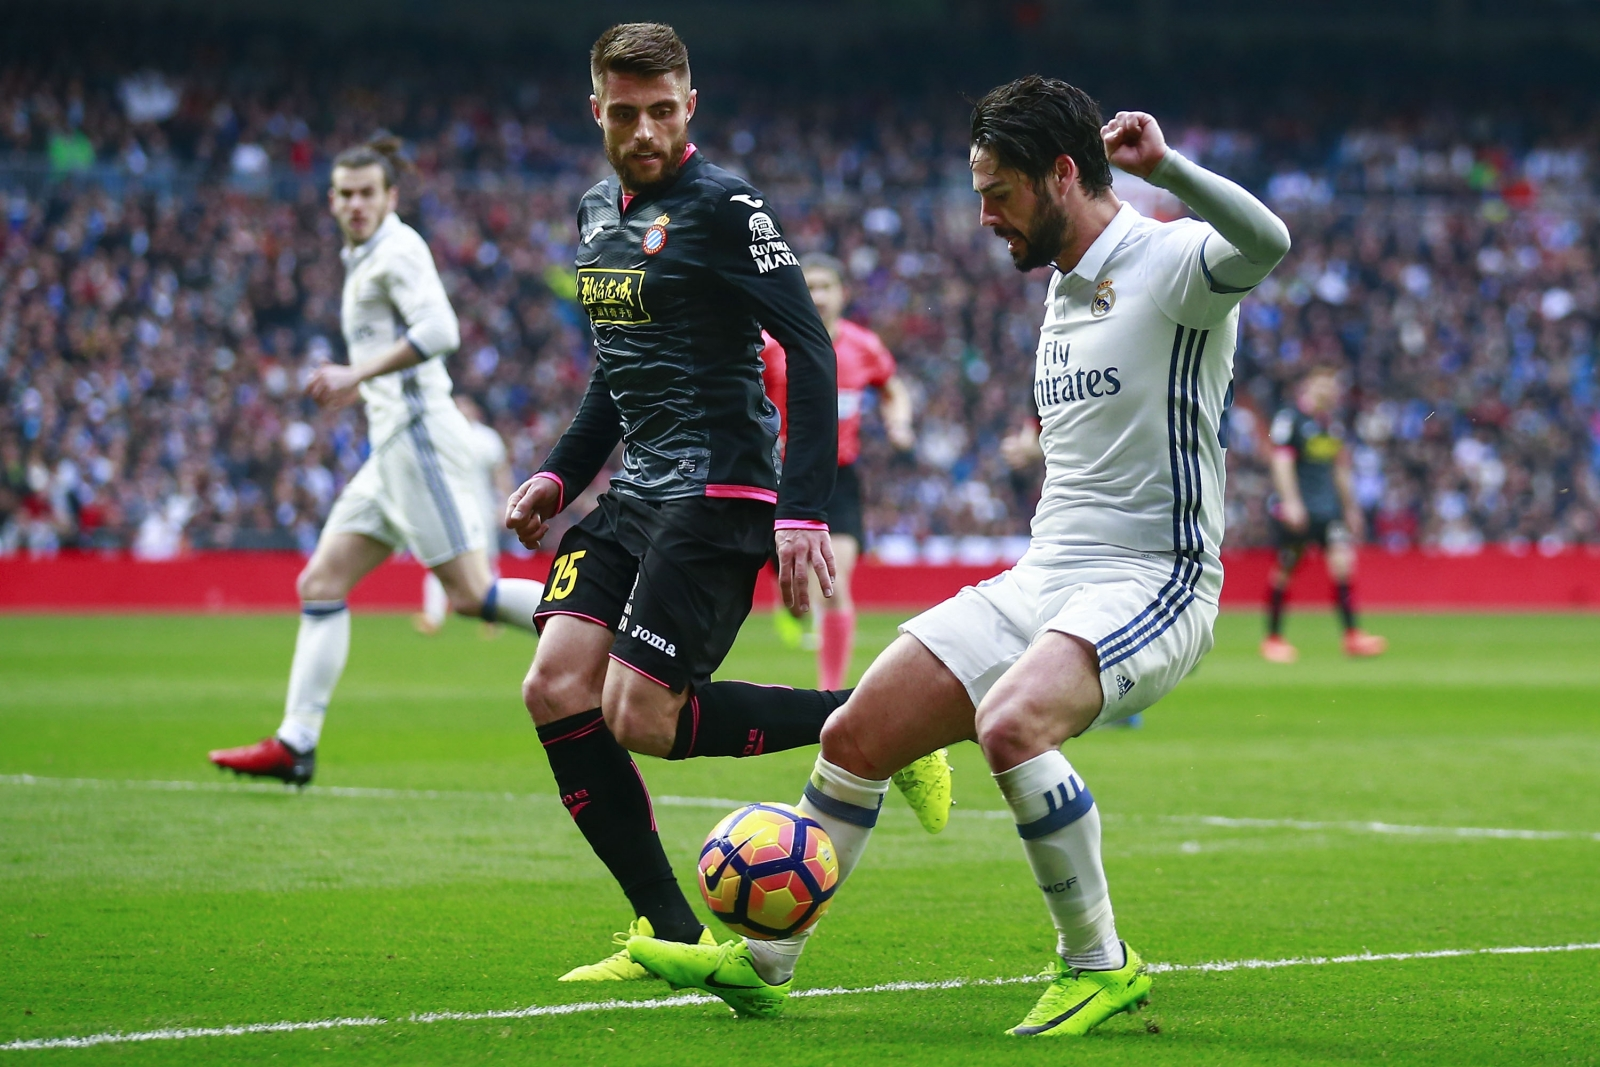 Zinedine Zidane discusses Real Madrid future of Isco, James Rodriguez and Pepe